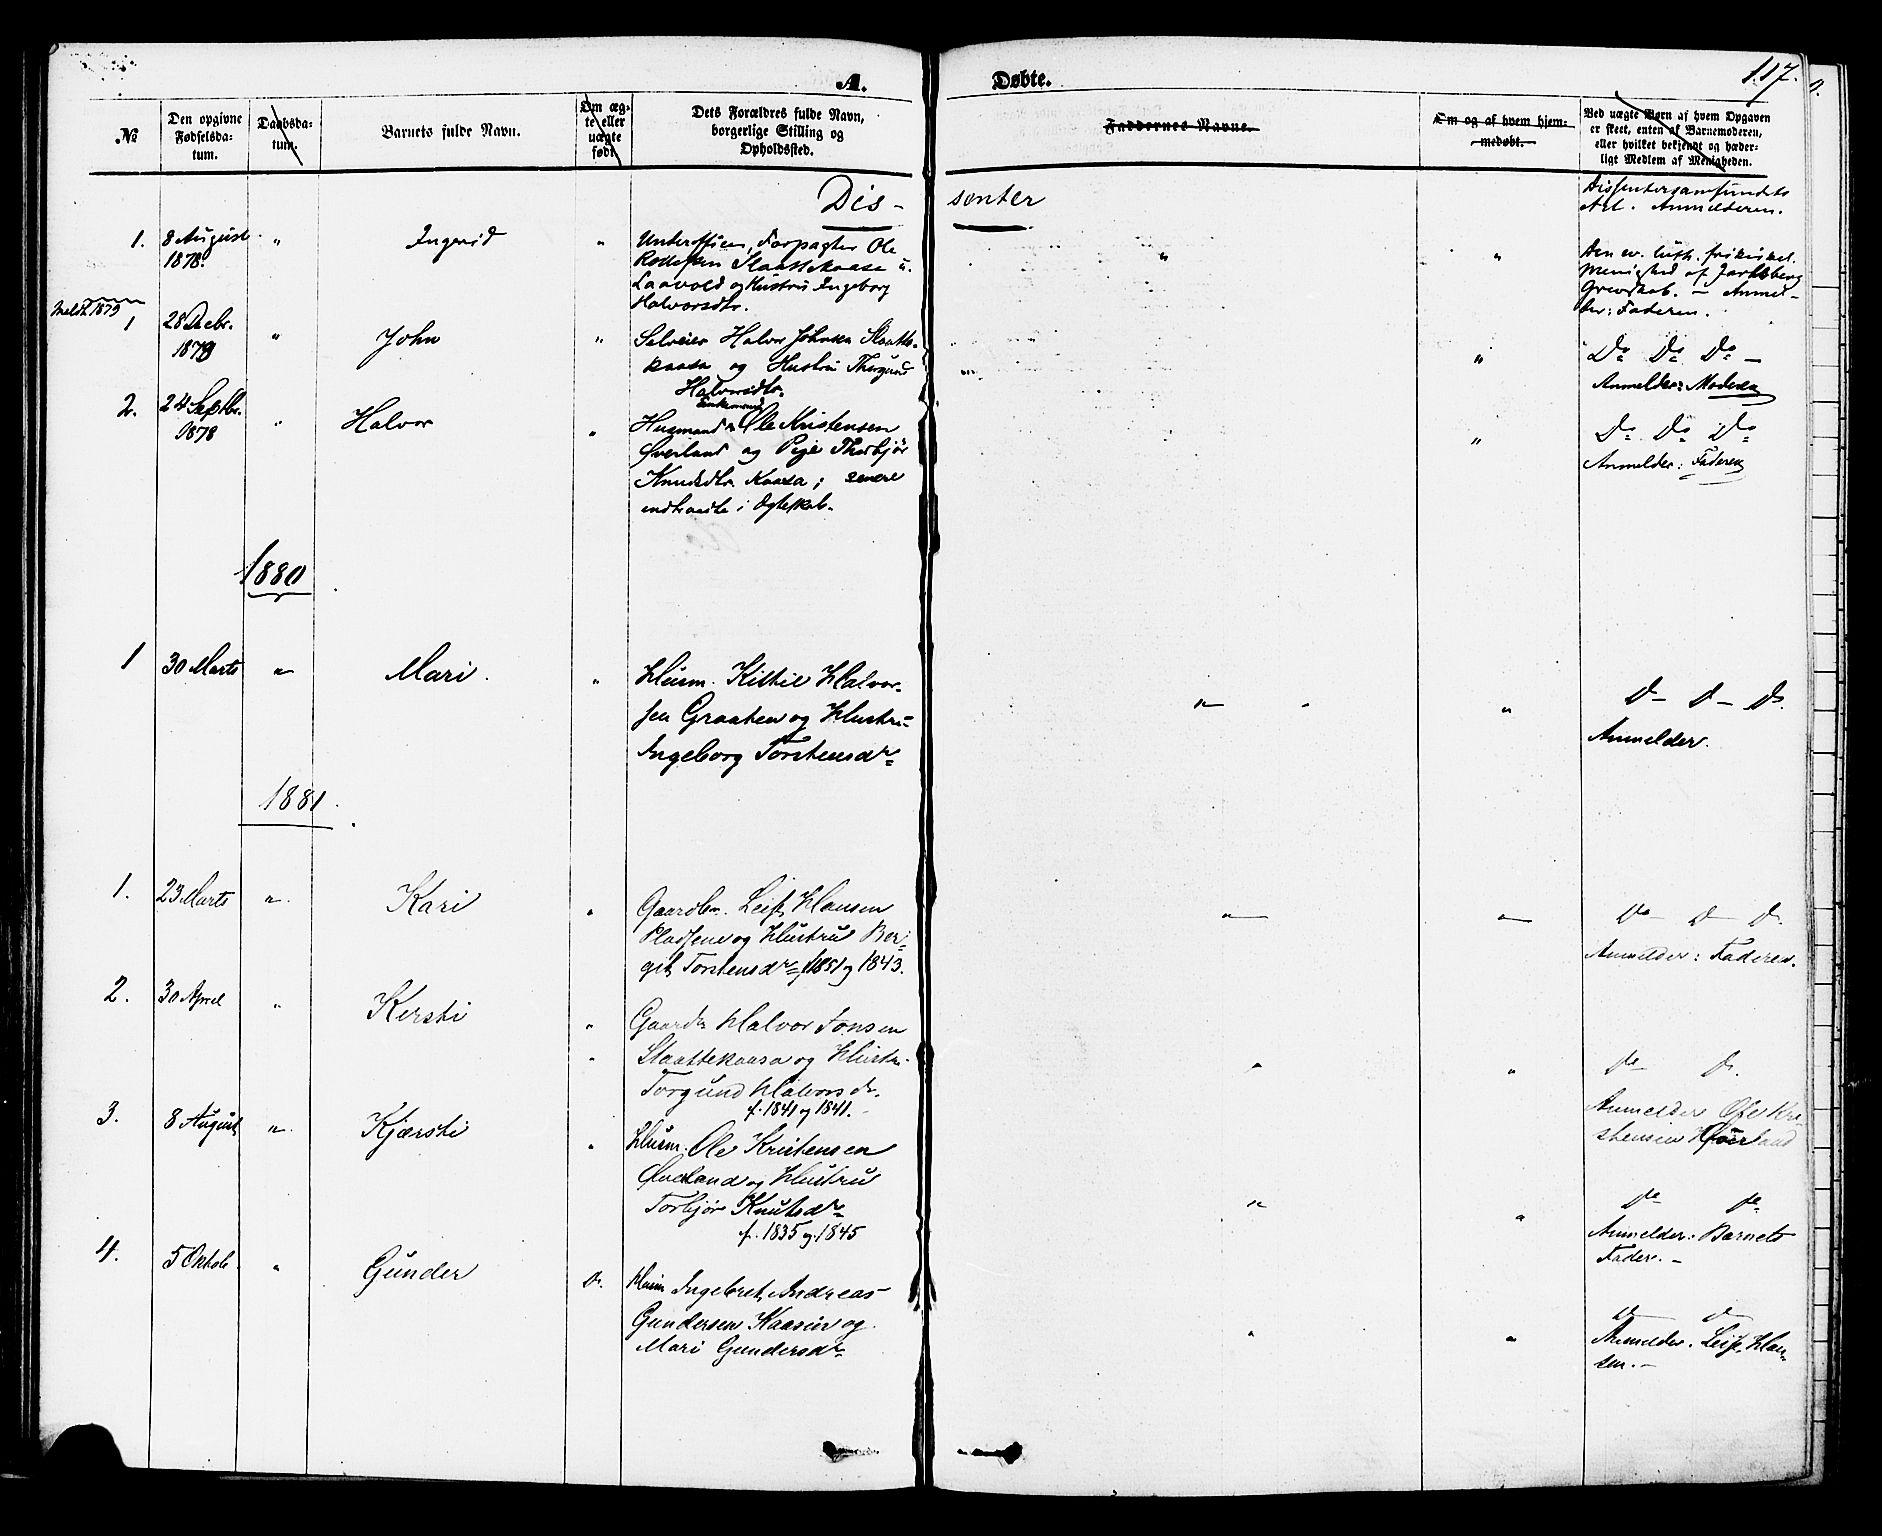 SAKO, Sauherad kirkebøker, F/Fa/L0008: Ministerialbok nr. I 8, 1873-1886, s. 117